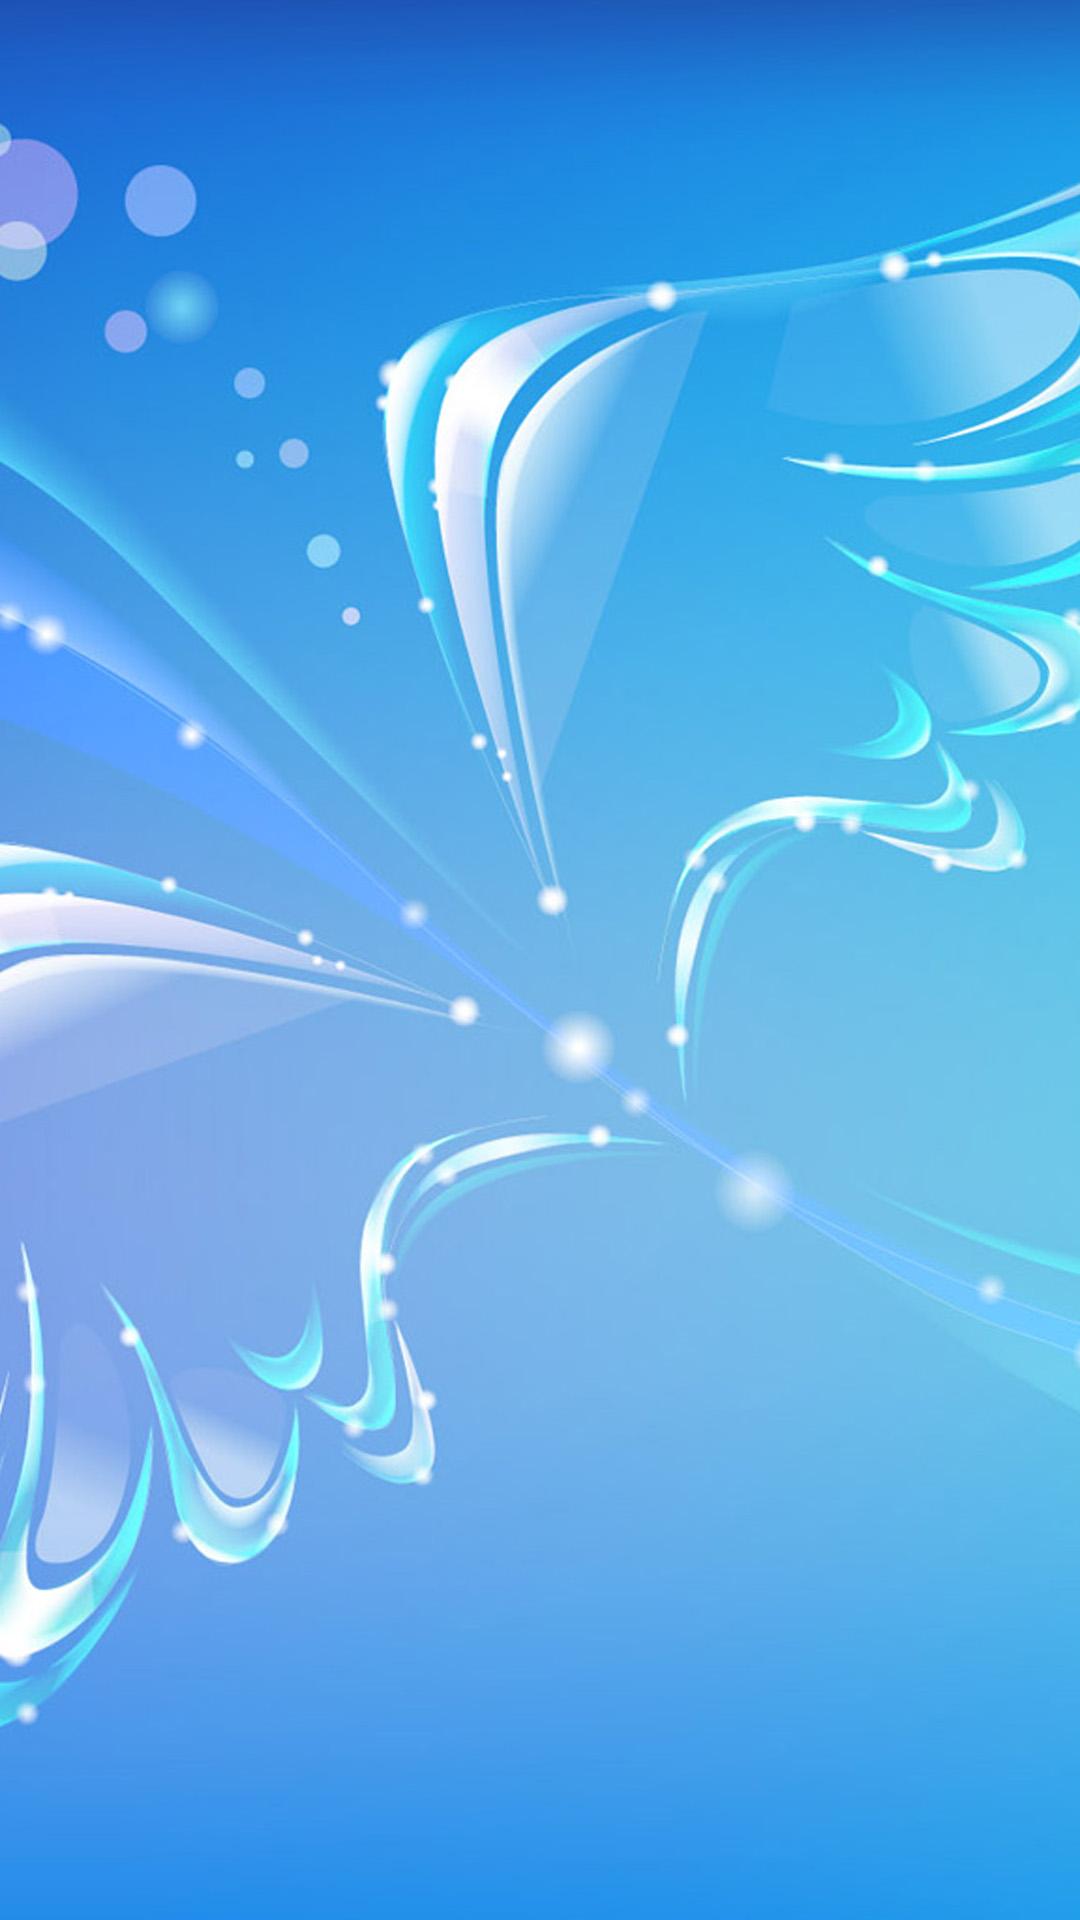 vector Samsung Galaxy S5 Wallpapers Samsung Galaxy S5 Wallpapers 1080x1920